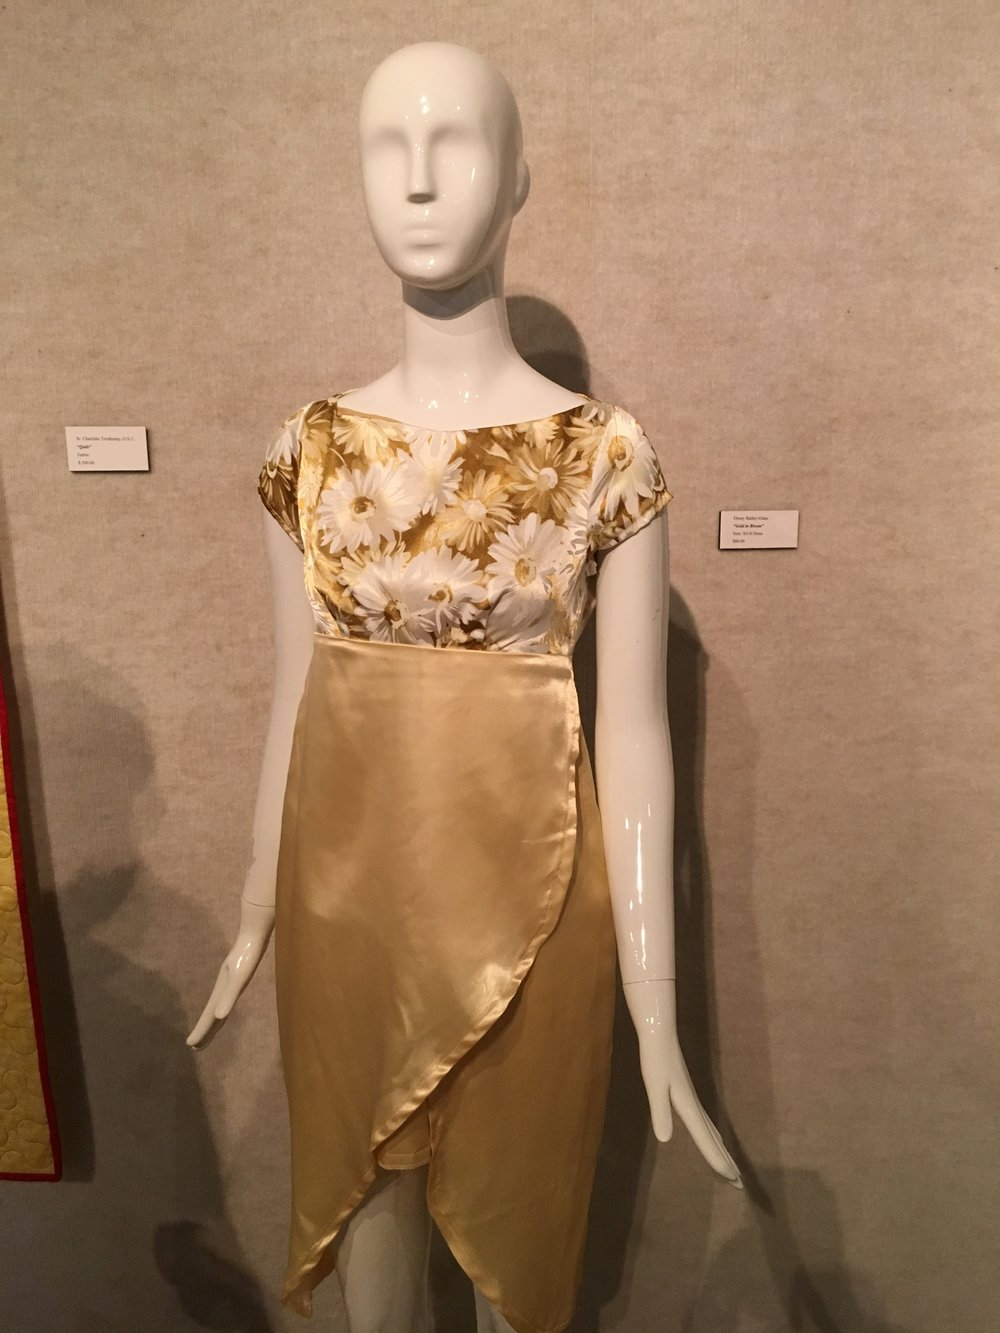 Fashion by: Ebony (Bailey) Glass